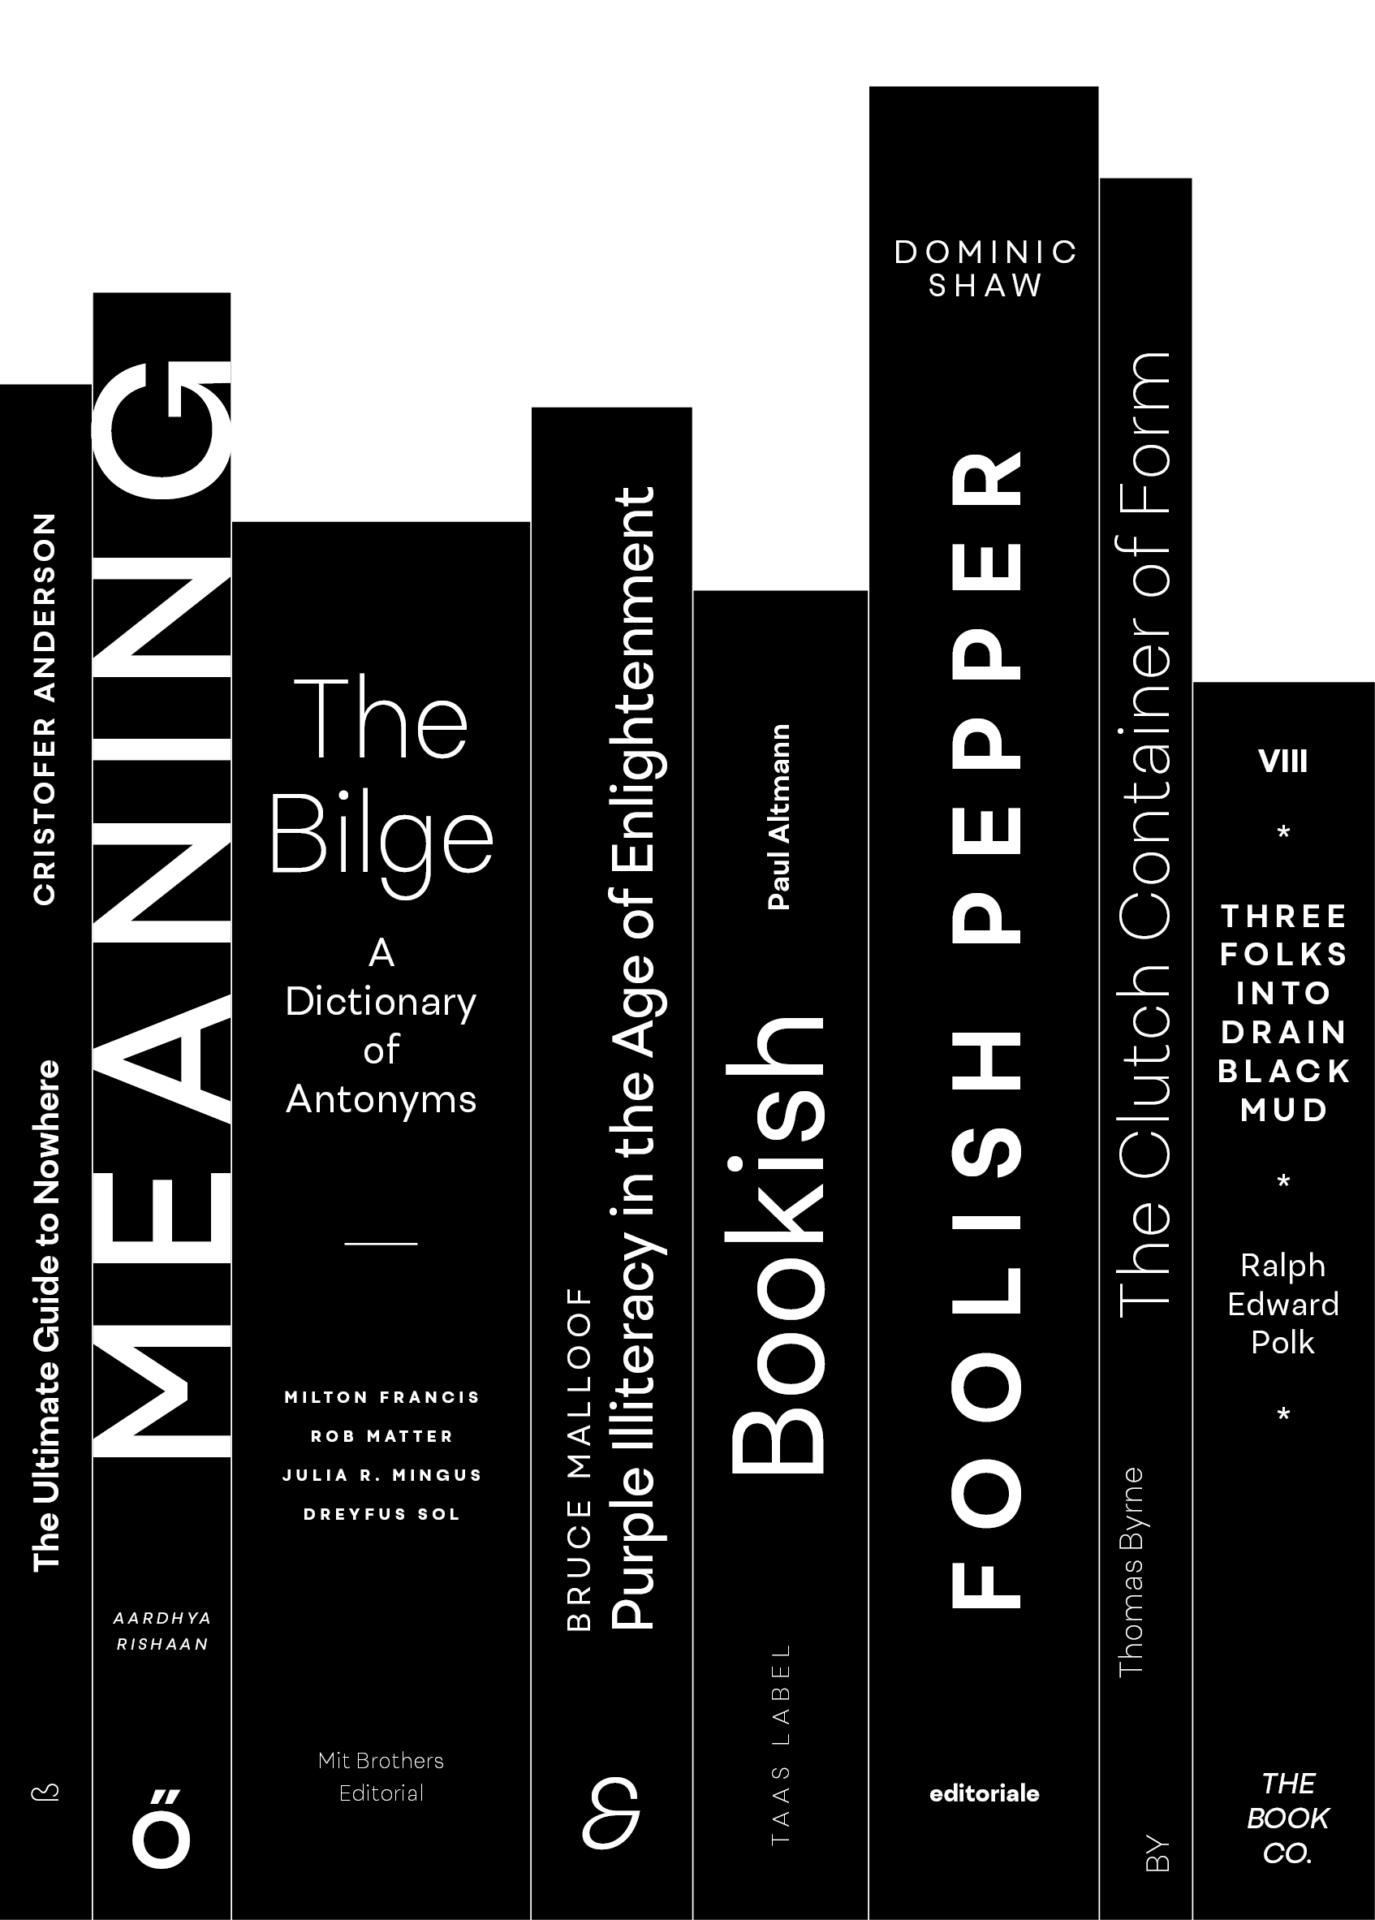 Uivo typeface books